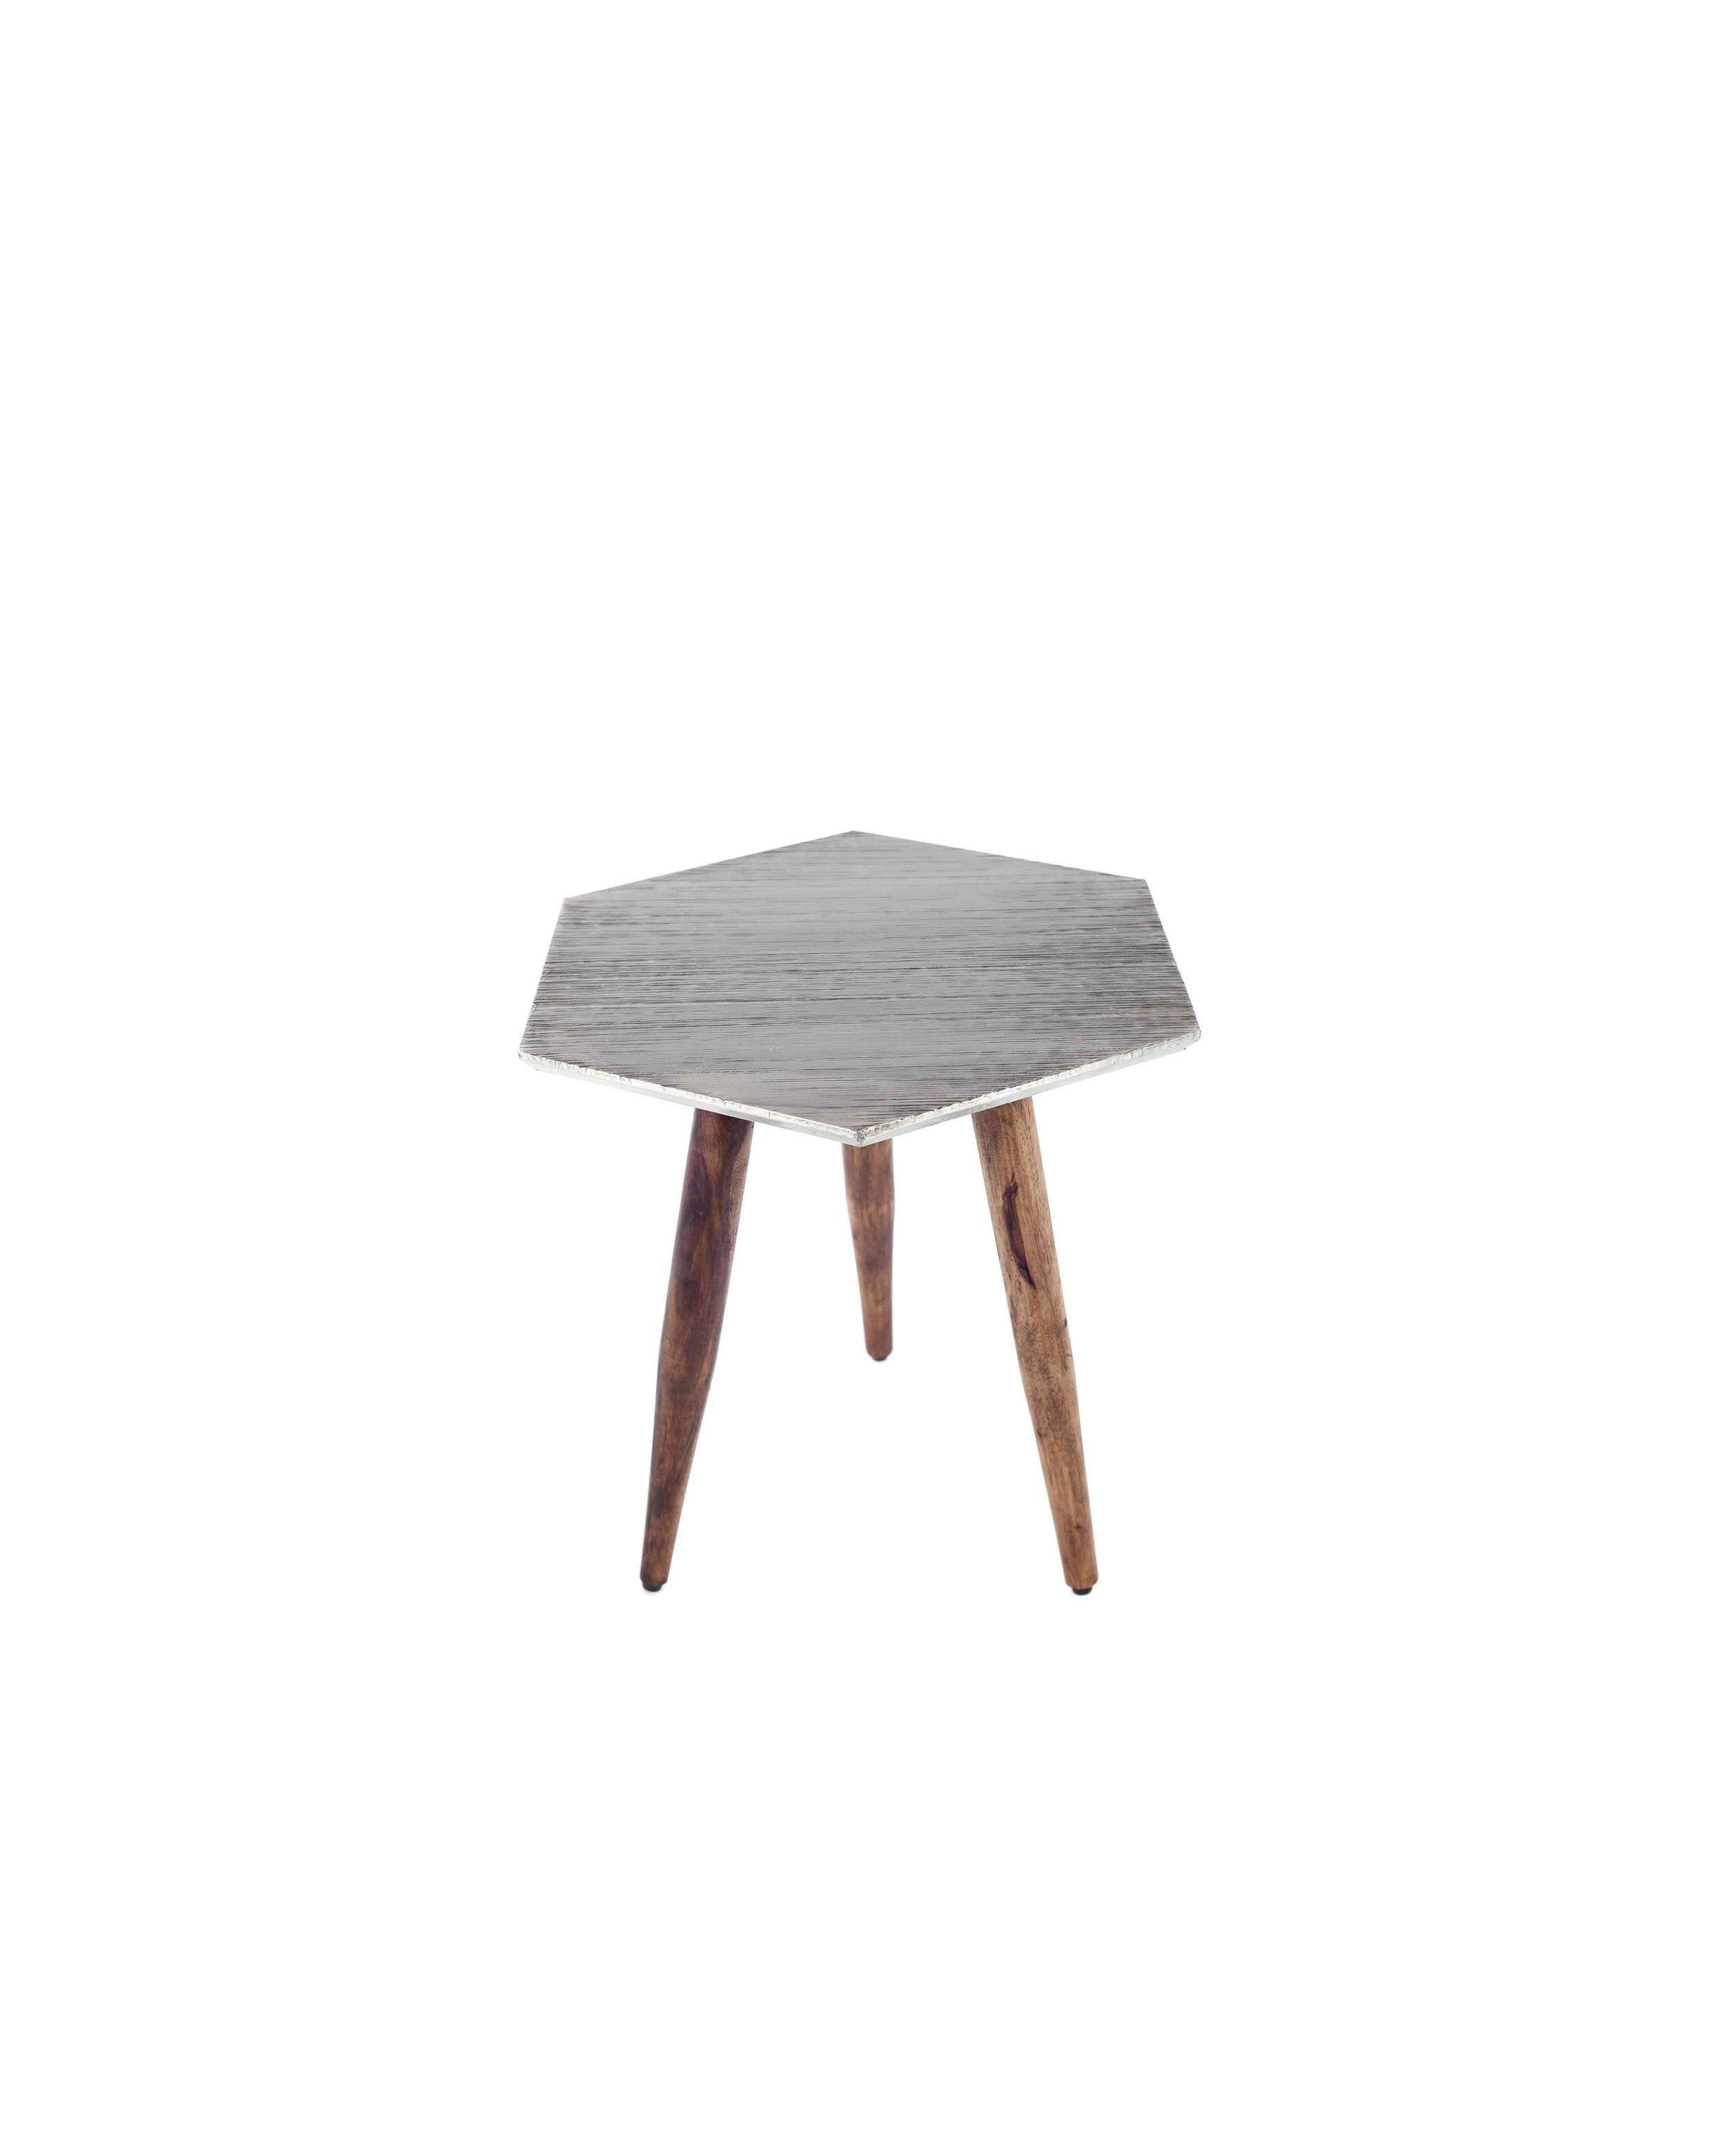 Geode Side Table Silver_lowres.jpg